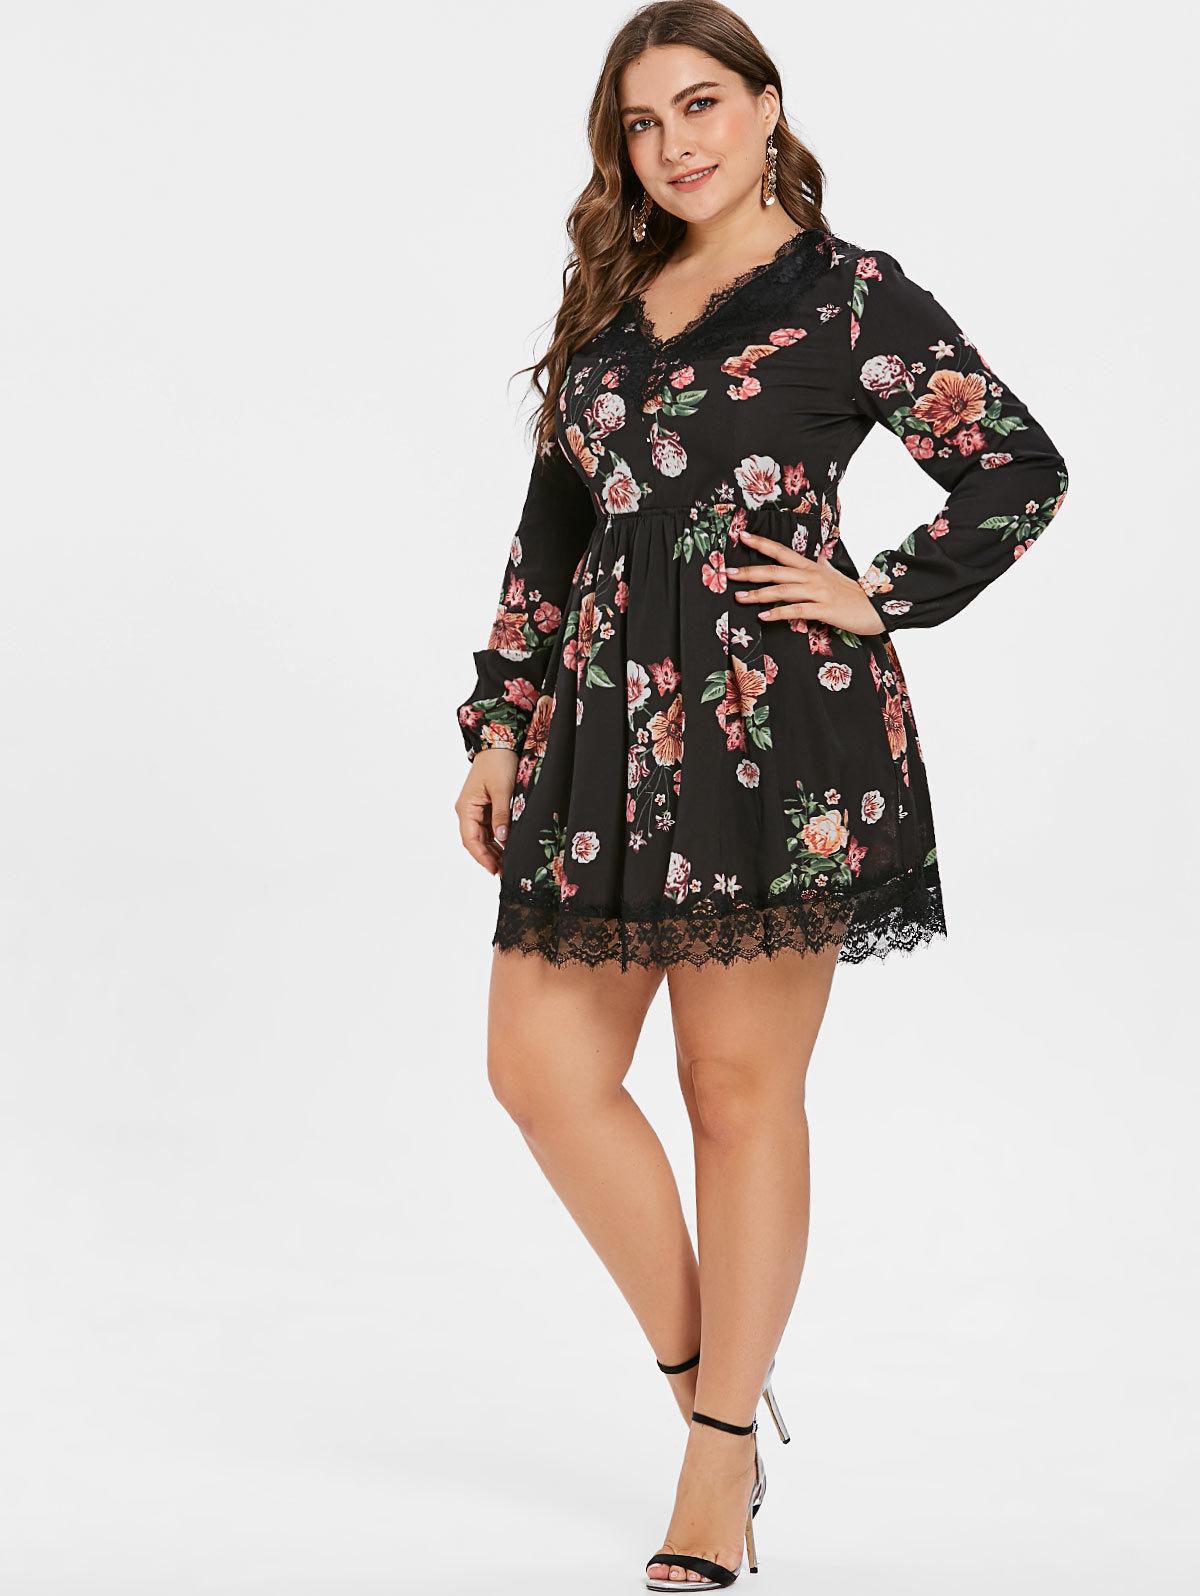 Wipalo Plus Size Lace Up Floral Print Mini Dress Casual V Neck A-Line Lace Trim Dress Oversized Women Fall Clothes 5XL Vestidos T190608